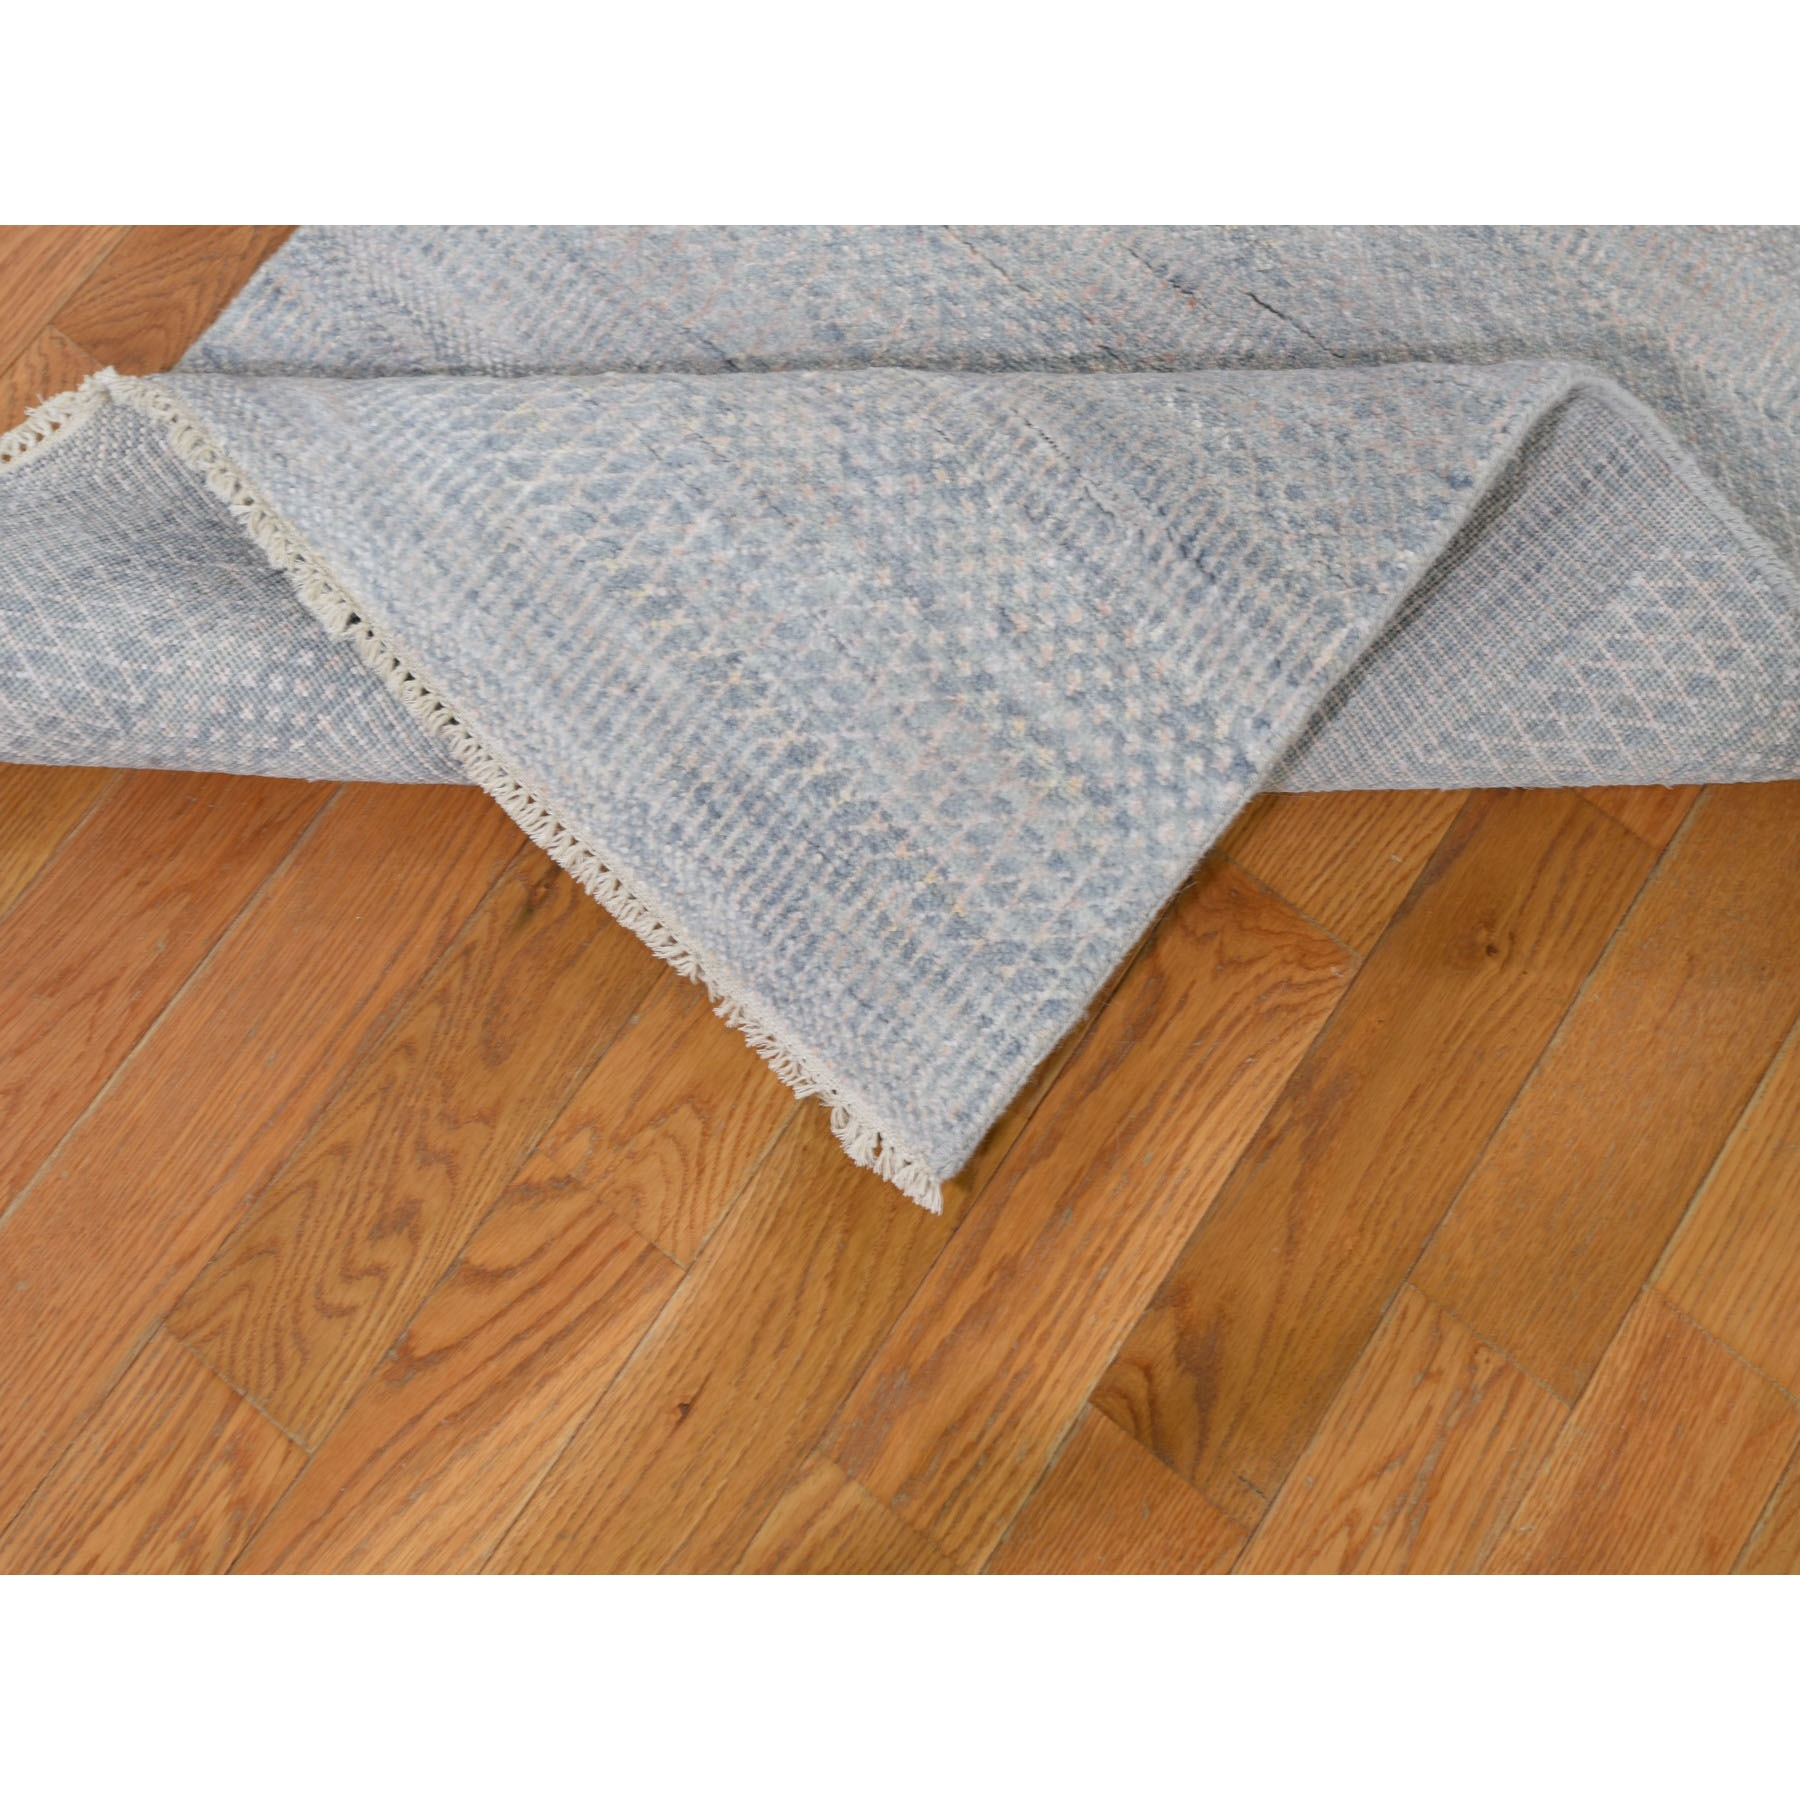 "2'6""x11'10"" Blue Grass Design Wool And Silk Runner Hand Knotted Oriental Rug"